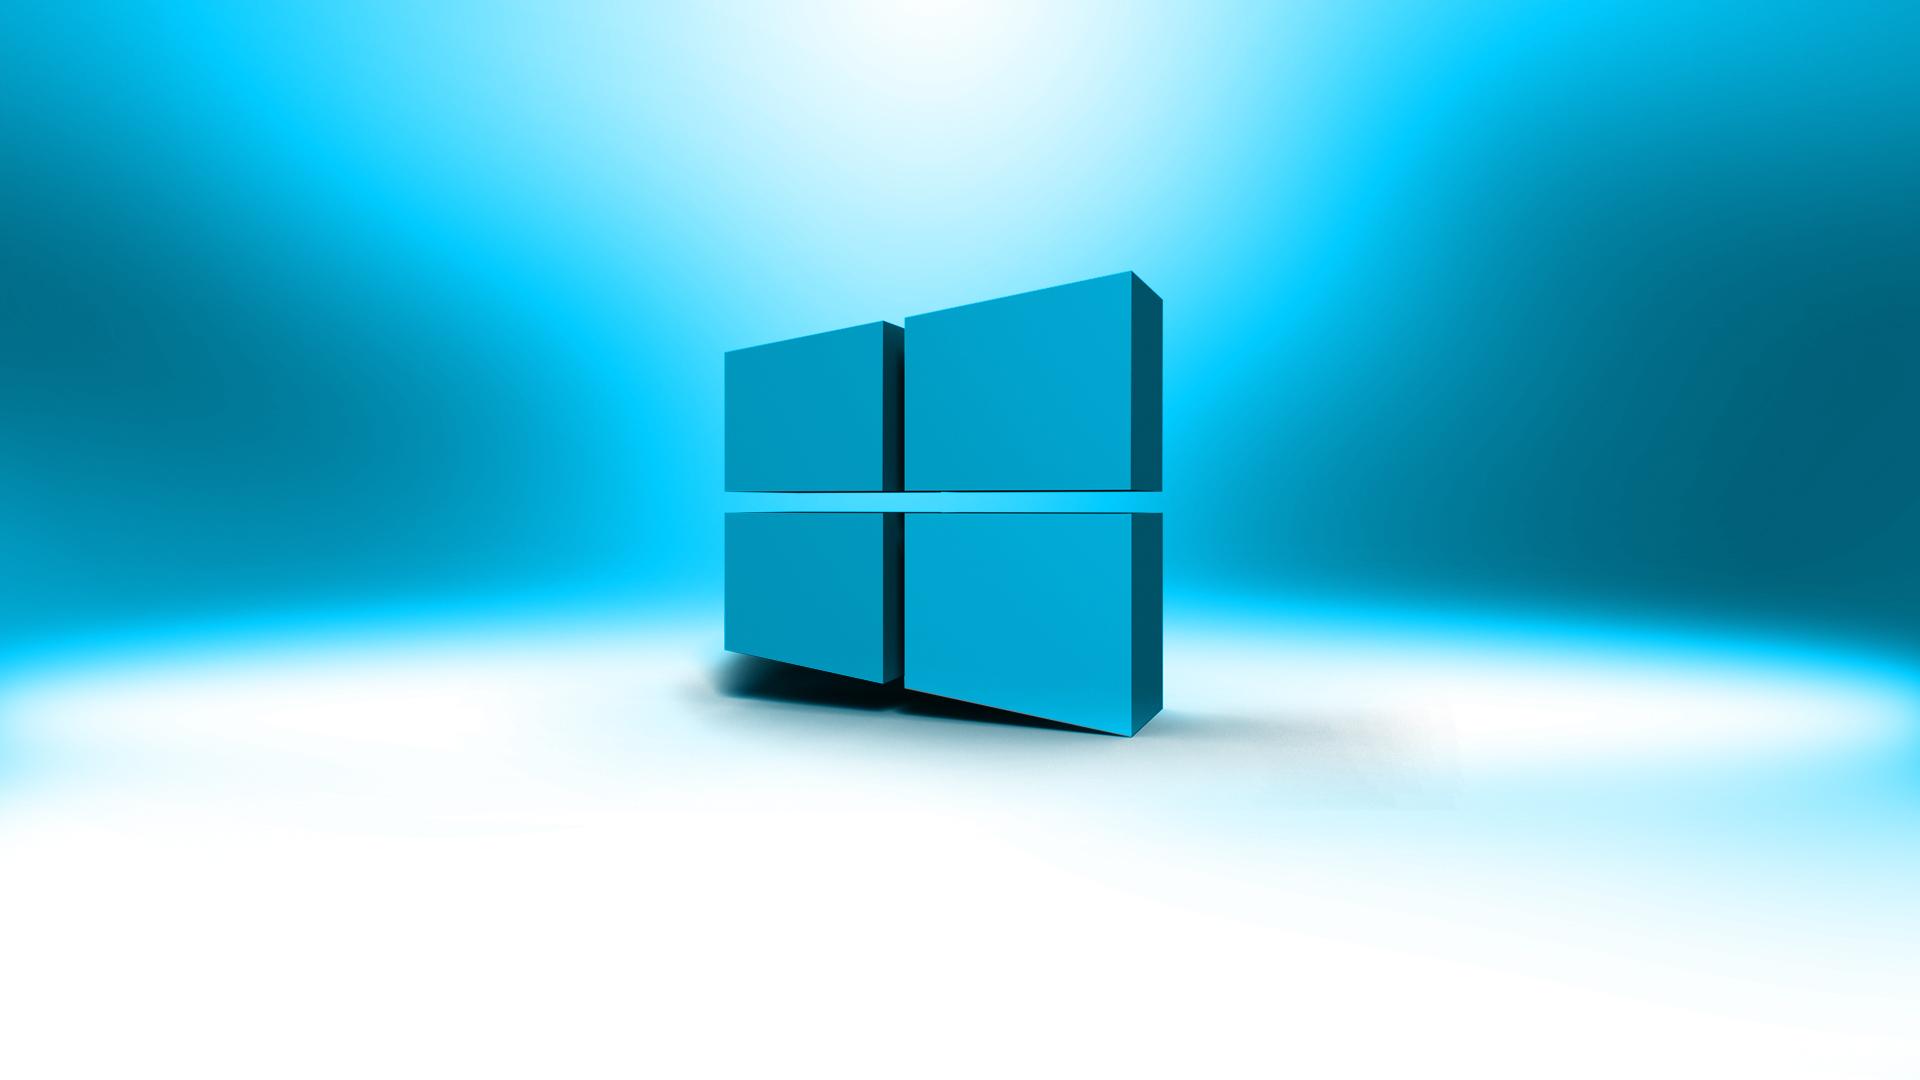 Windows-10-HD-Wallpaper-4